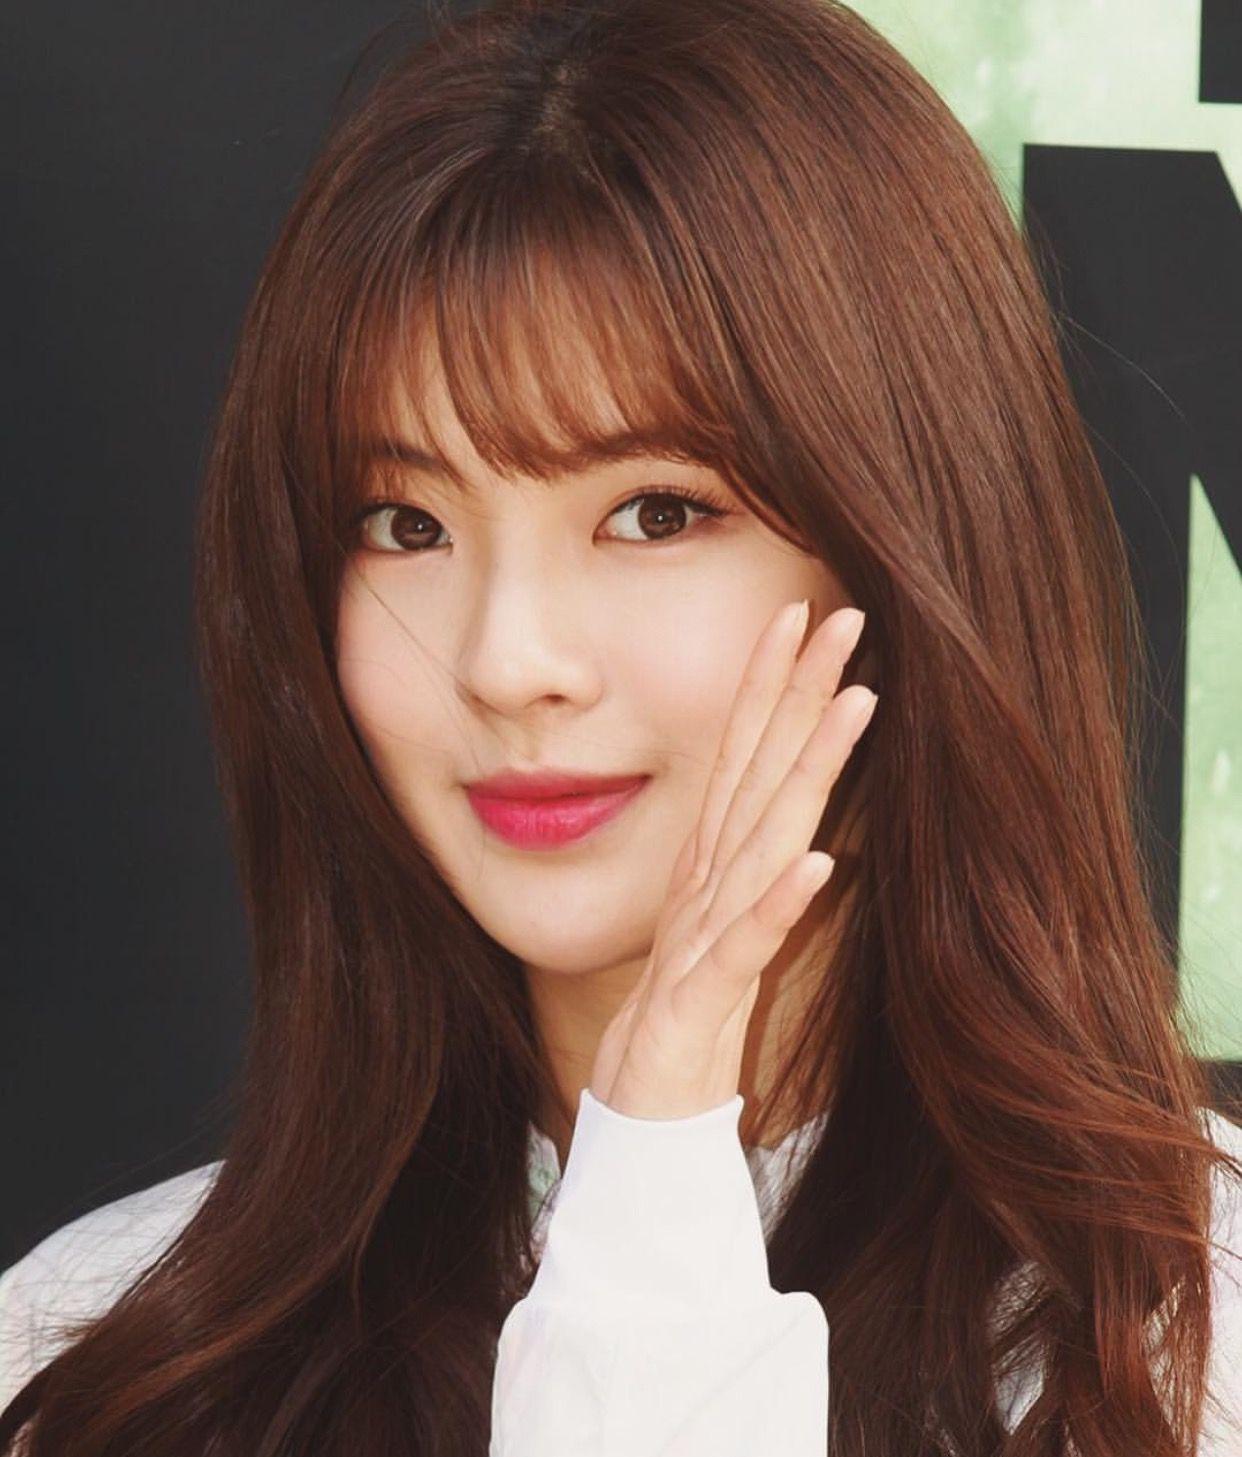 Movie Addict: My Top 10 Prettiest Korean Actresses